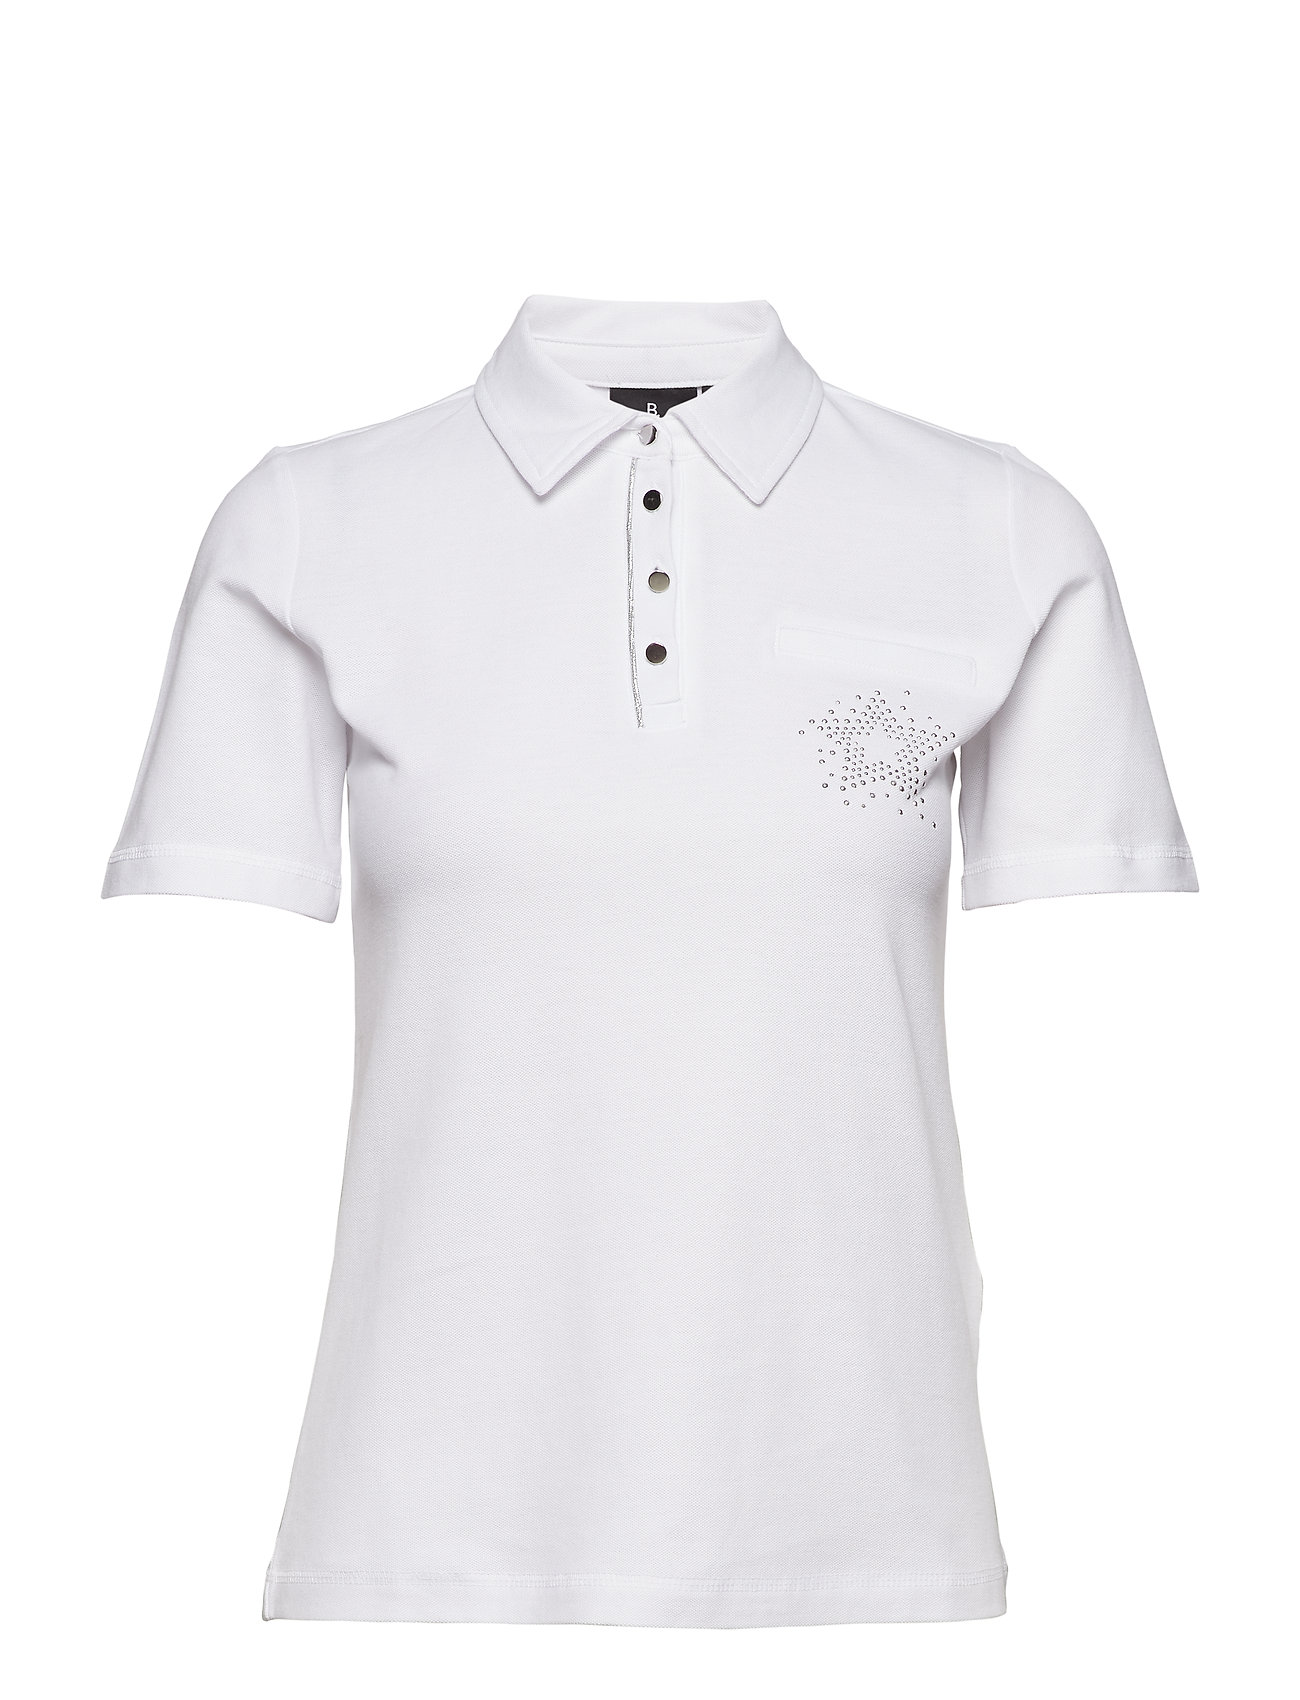 Image of Polo Shirt T-Shirts & Tops Polo-Skjorte Hvid BRANDTEX (3109949721)